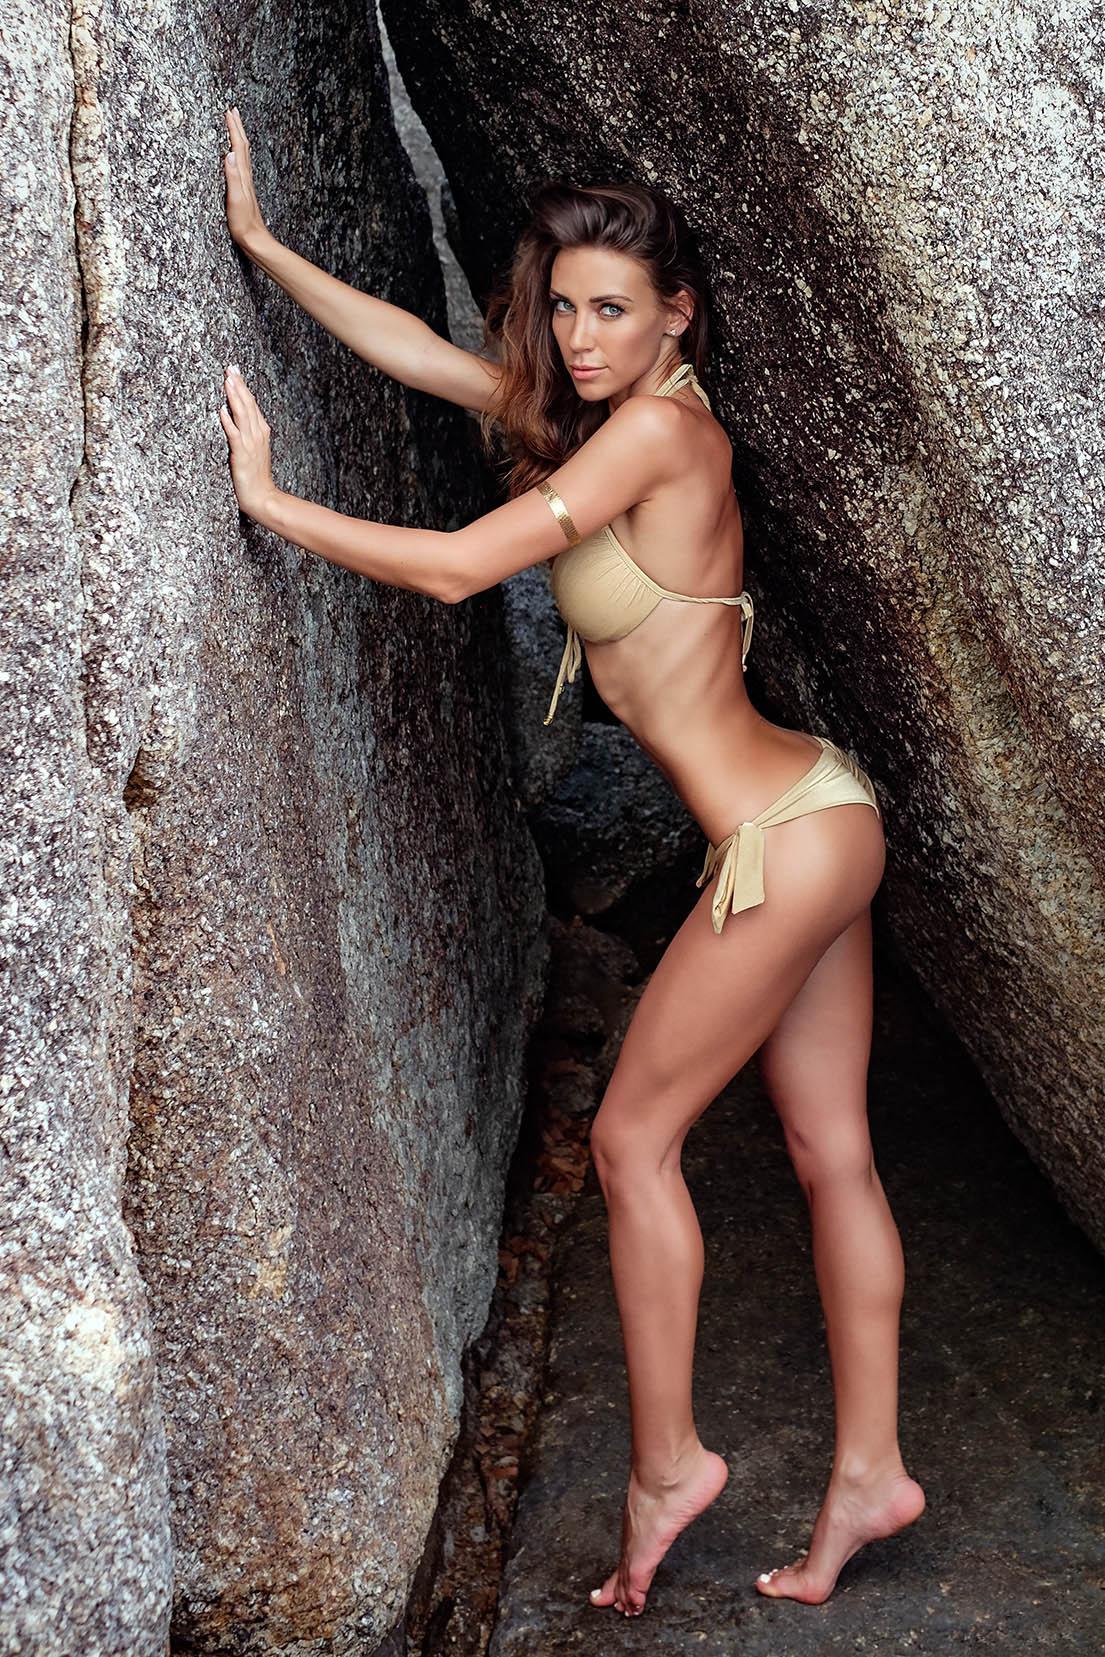 Pussy Maria Mezentseva  nudes (61 pics), Instagram, braless